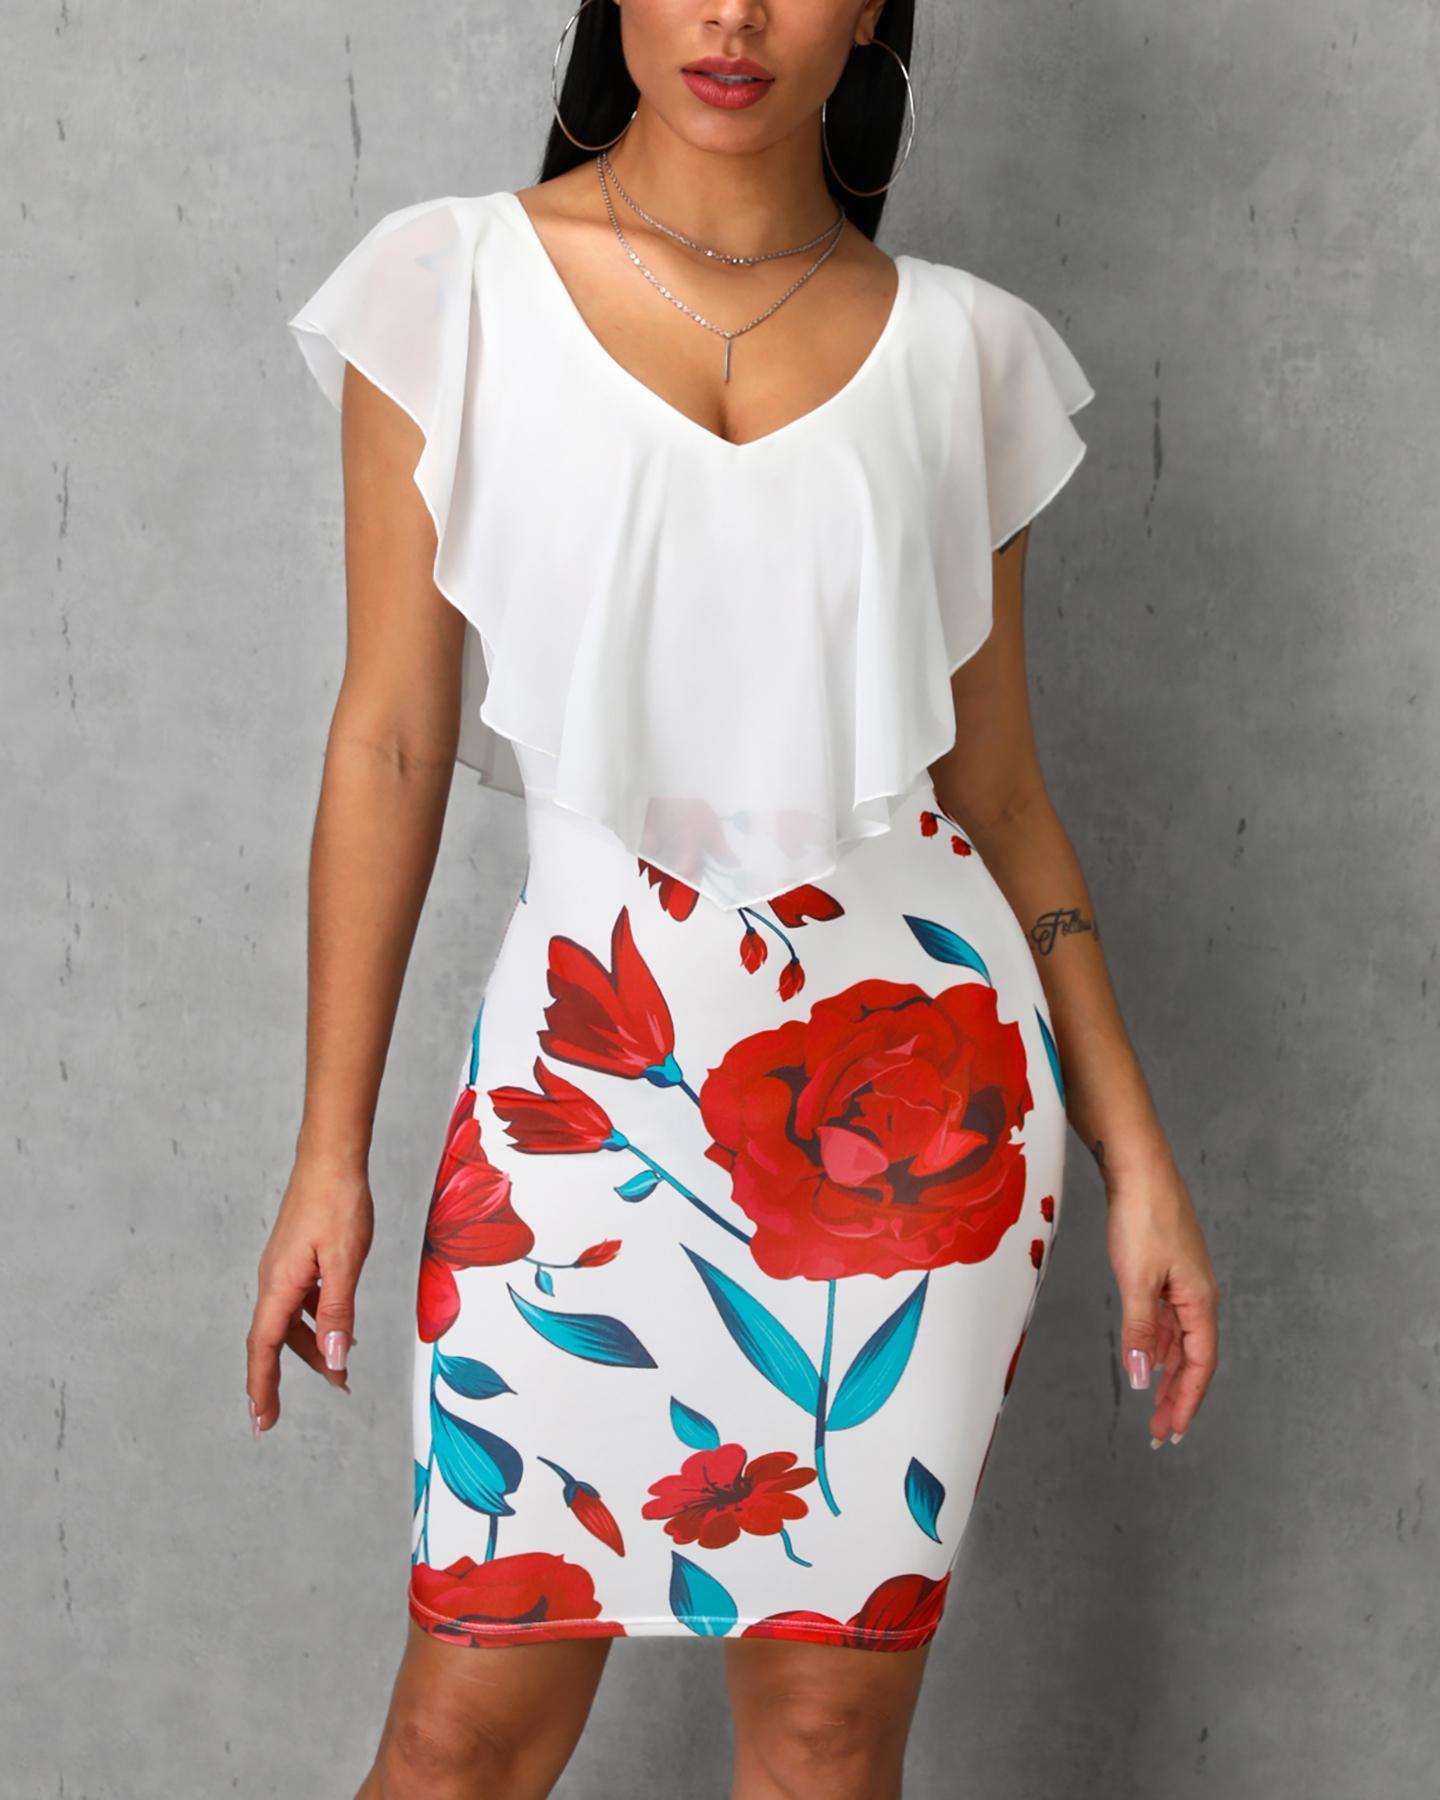 Floral Print Ruffles Design Bodycon Dress фото